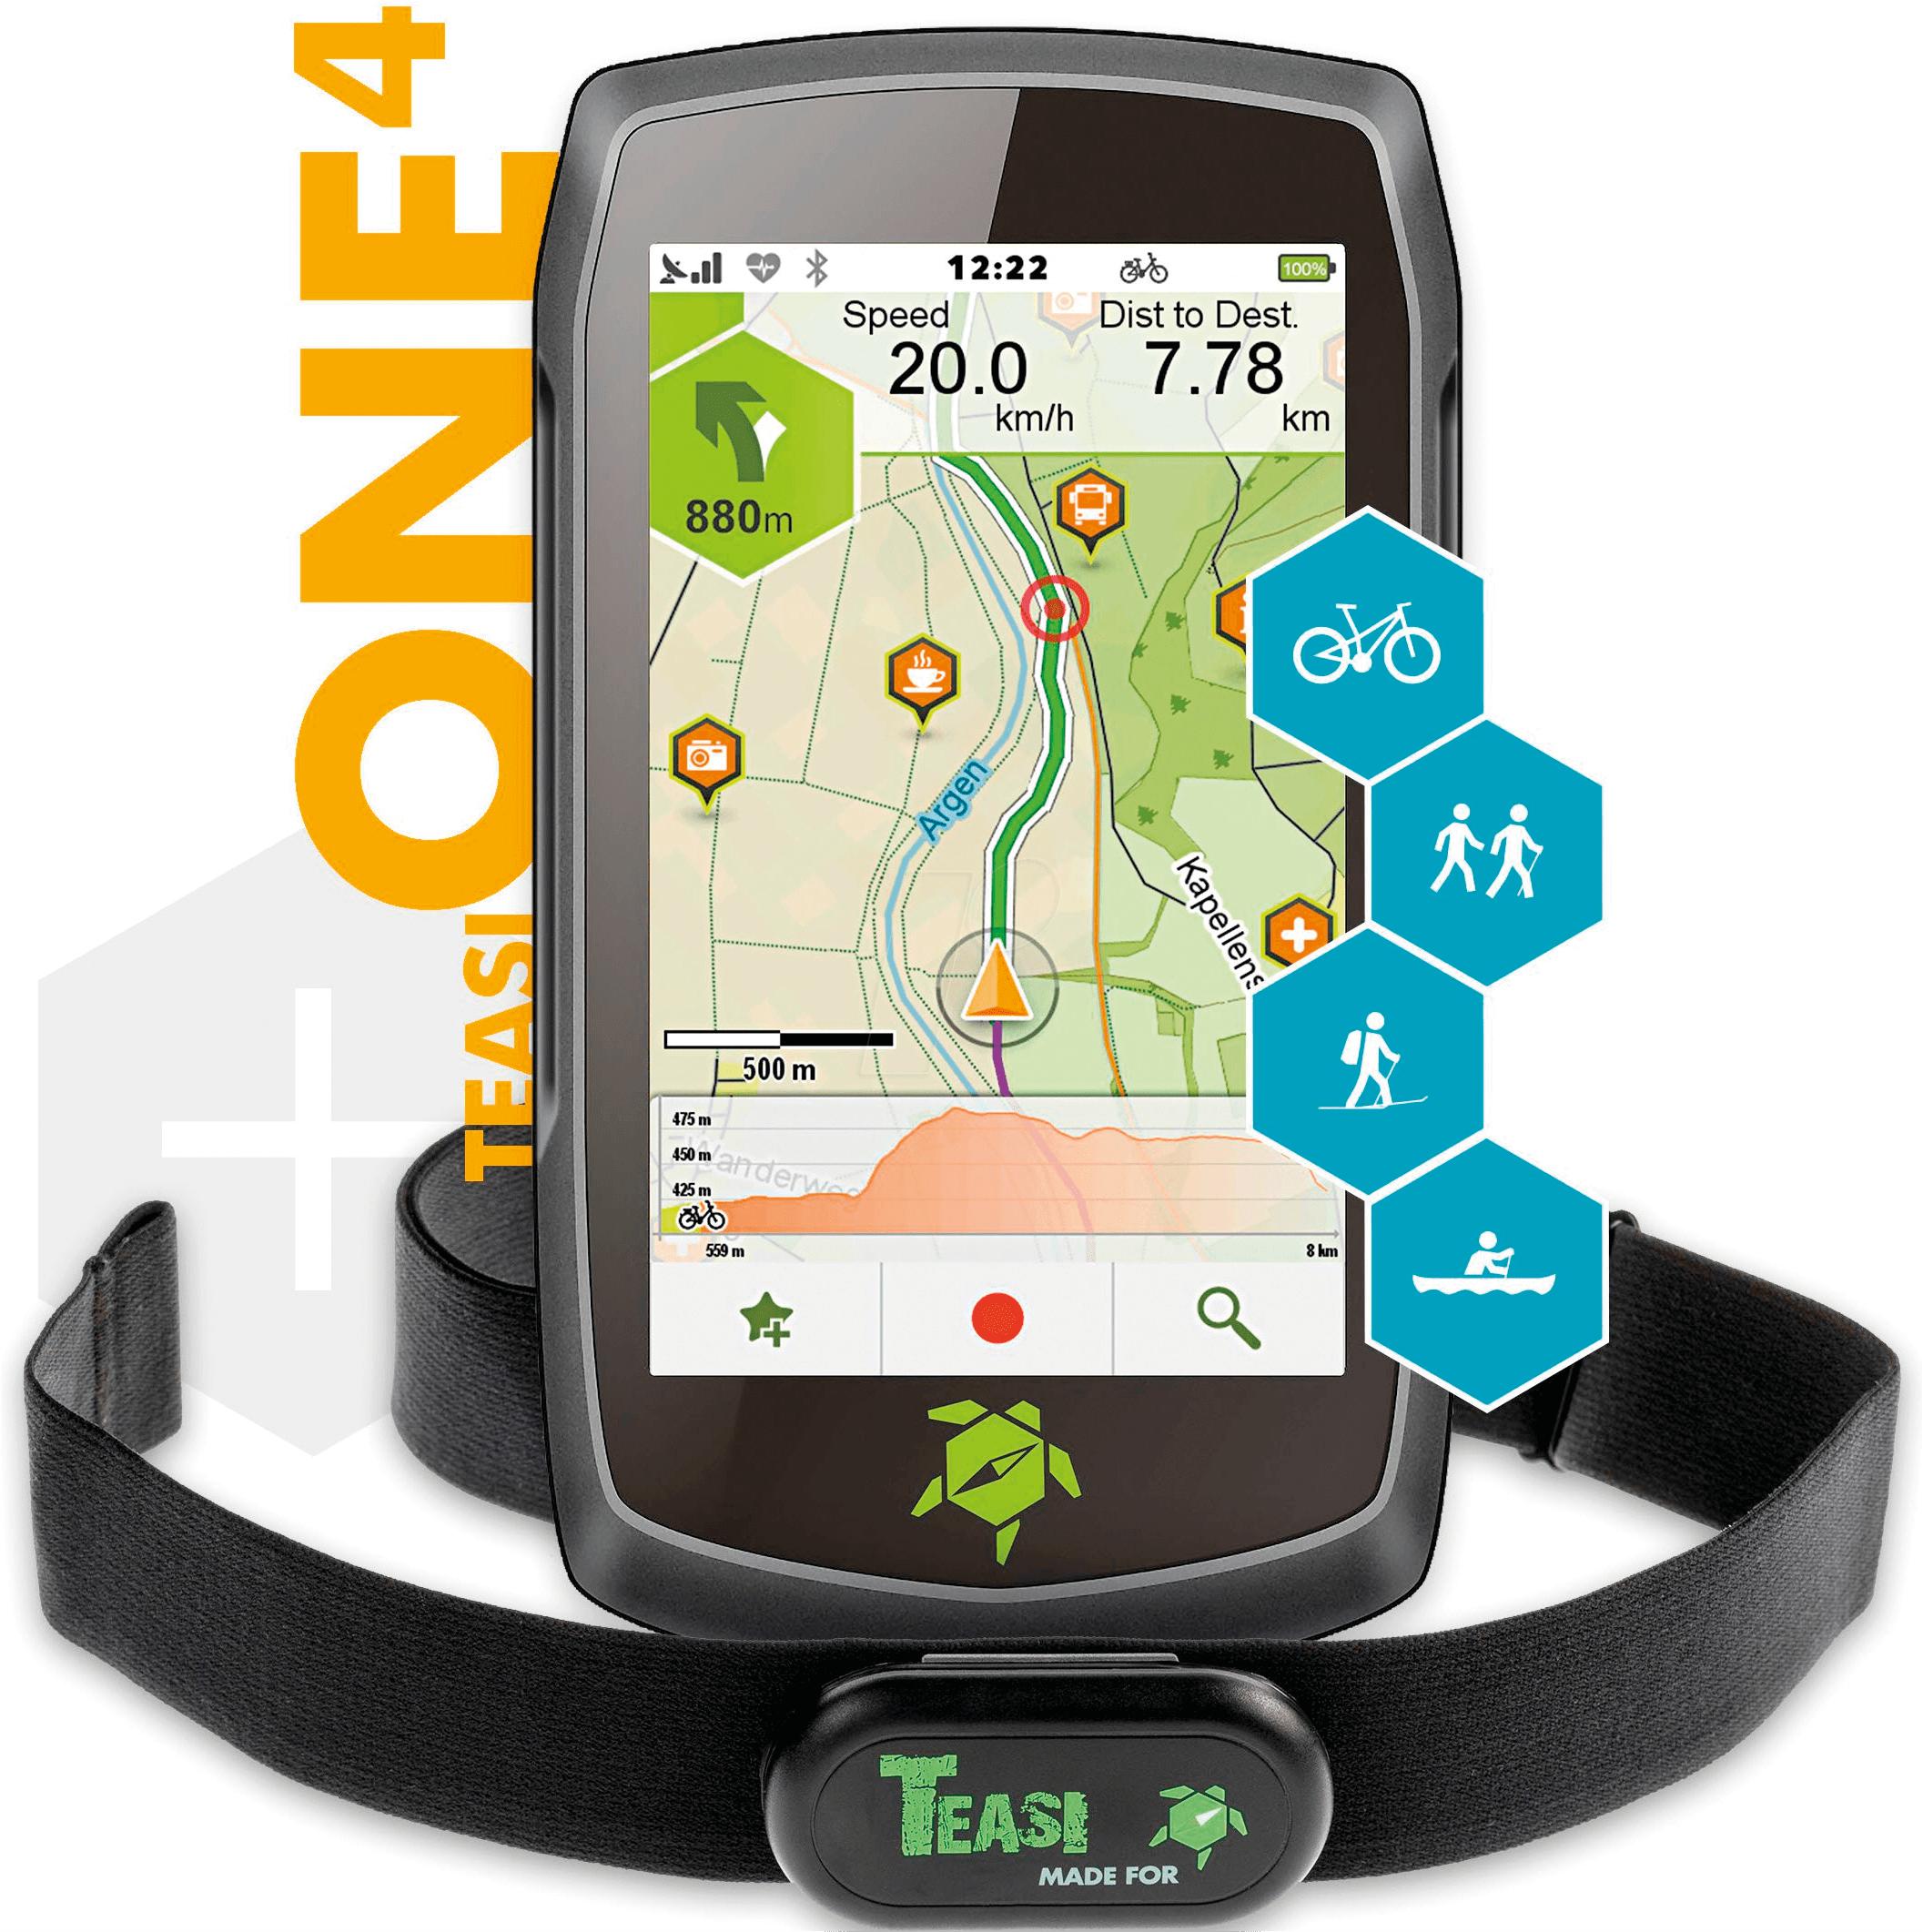 TEASI ONE 4HR - Outdoor navigation device incl  HR sensor